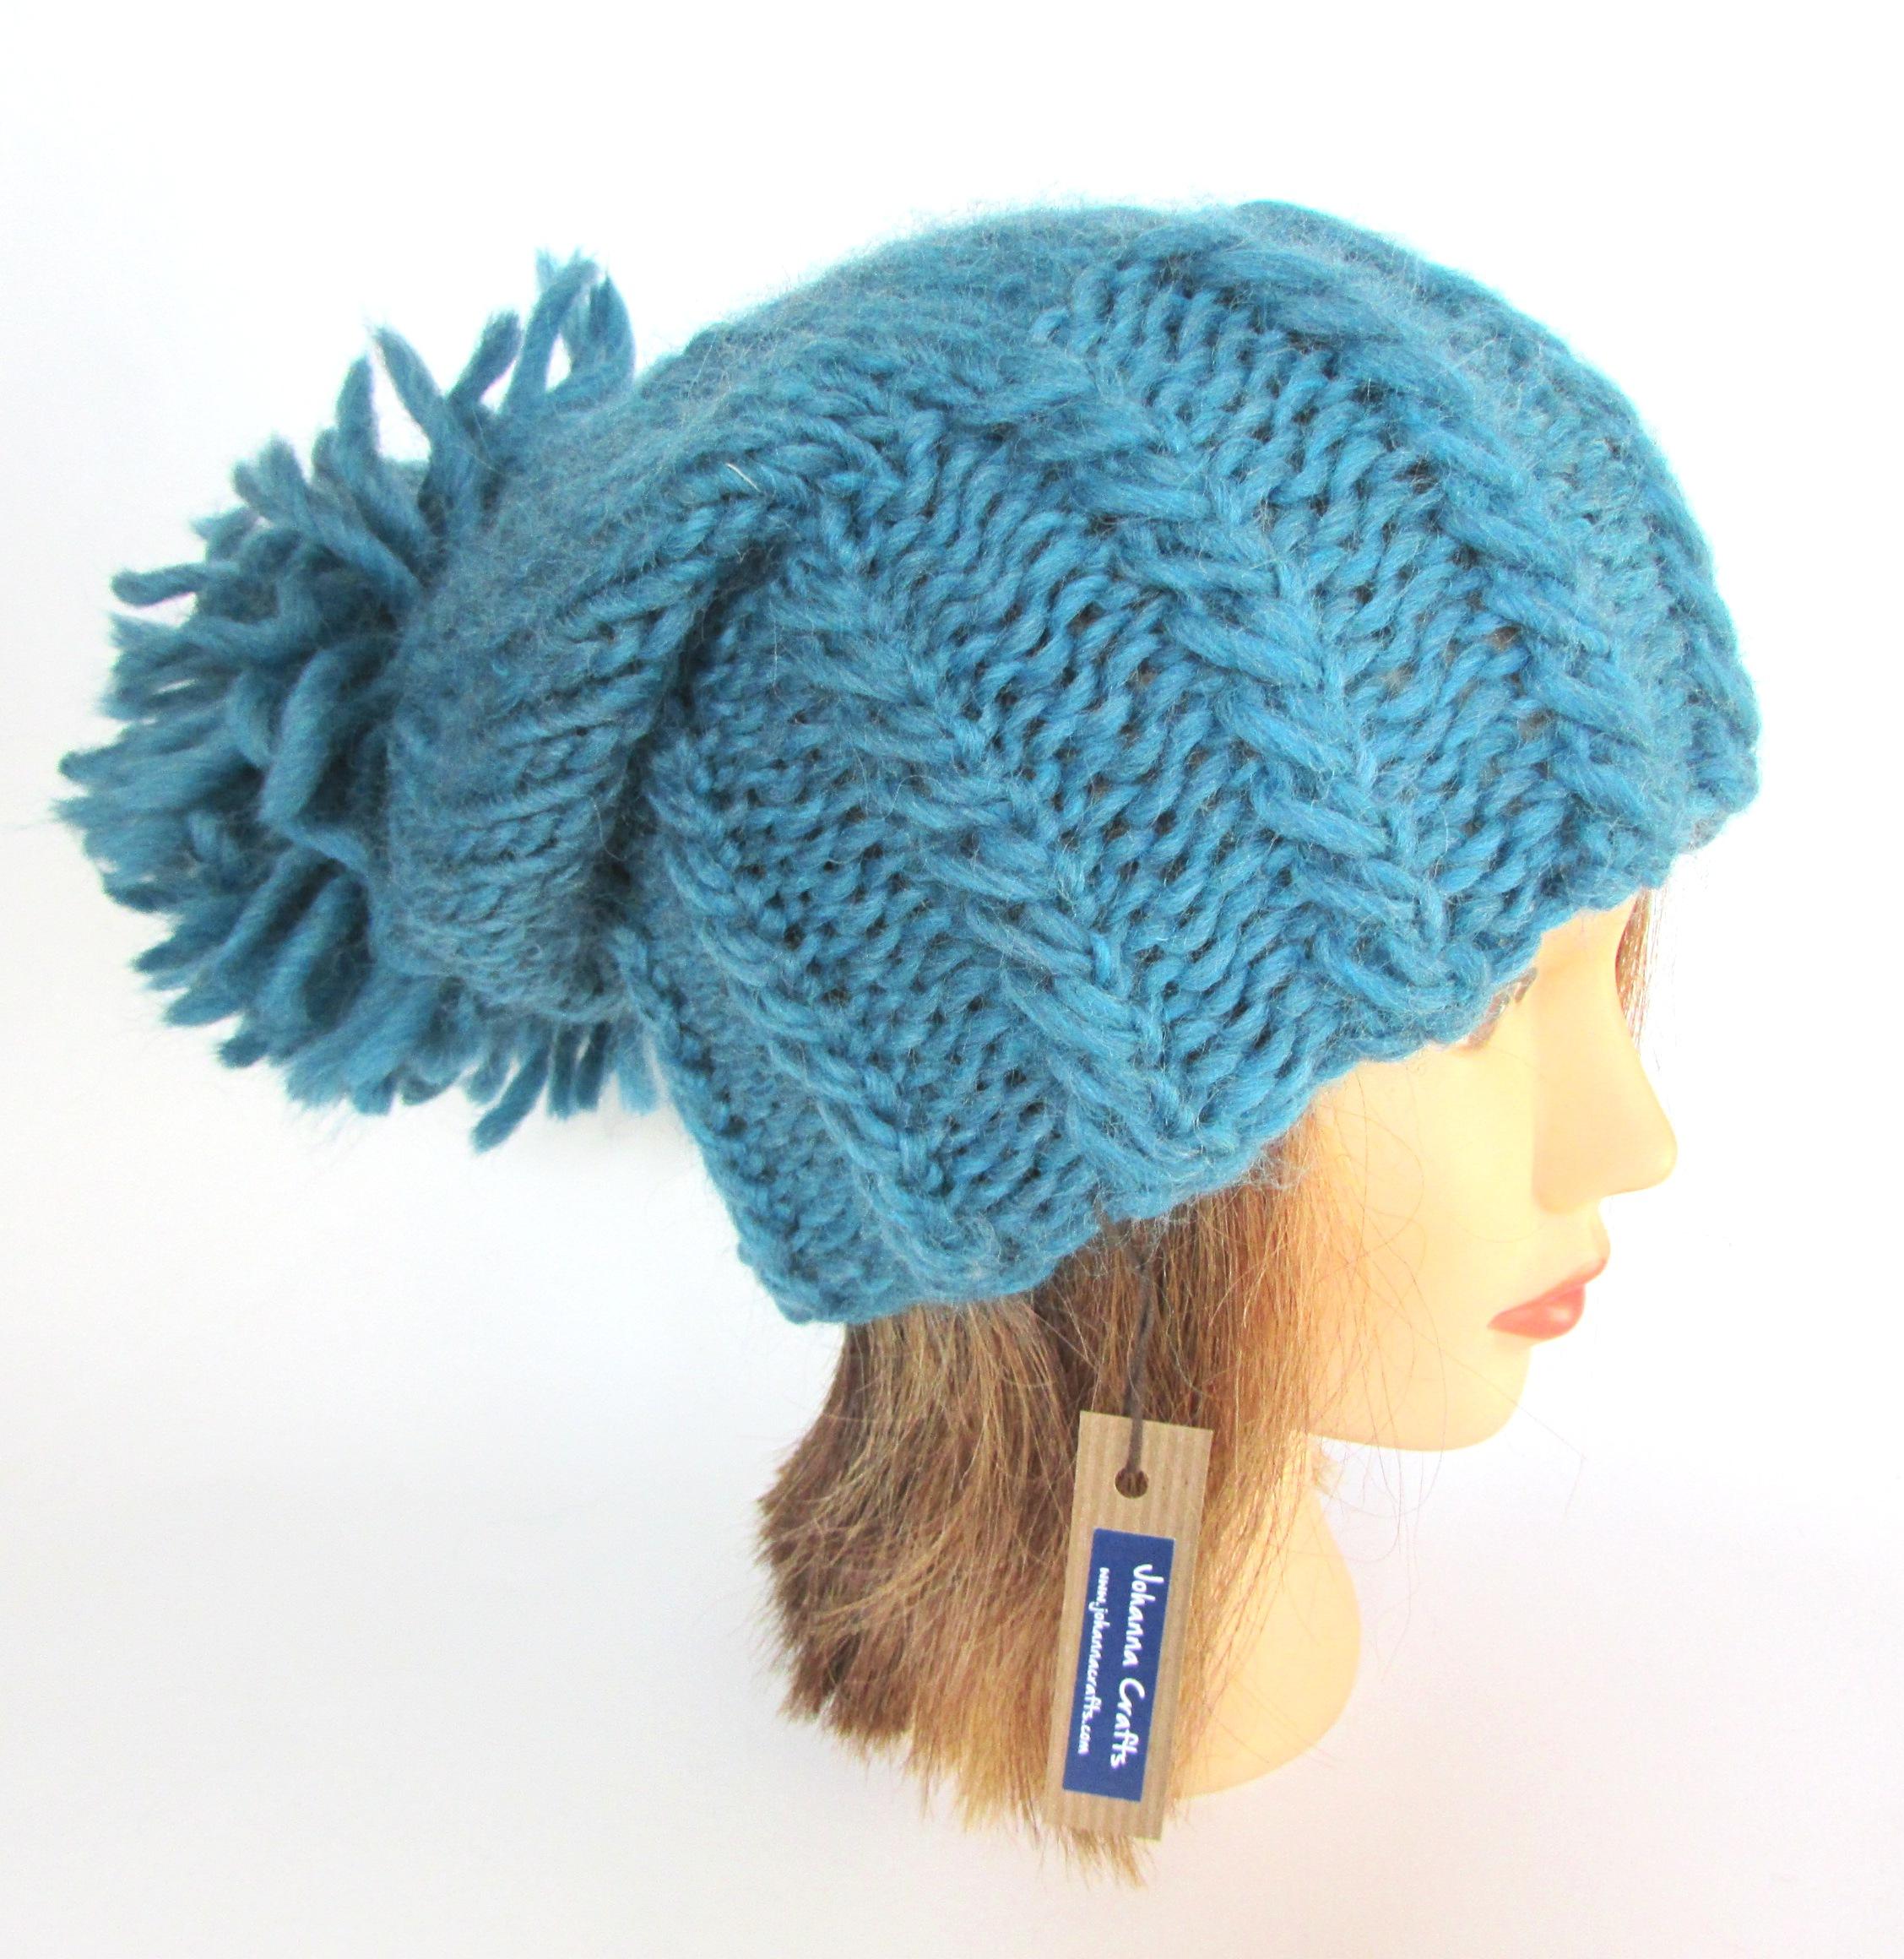 e888bd6080fe0 Irish hand knit petrol blue hat with large pom pom - chunky knit fun ...